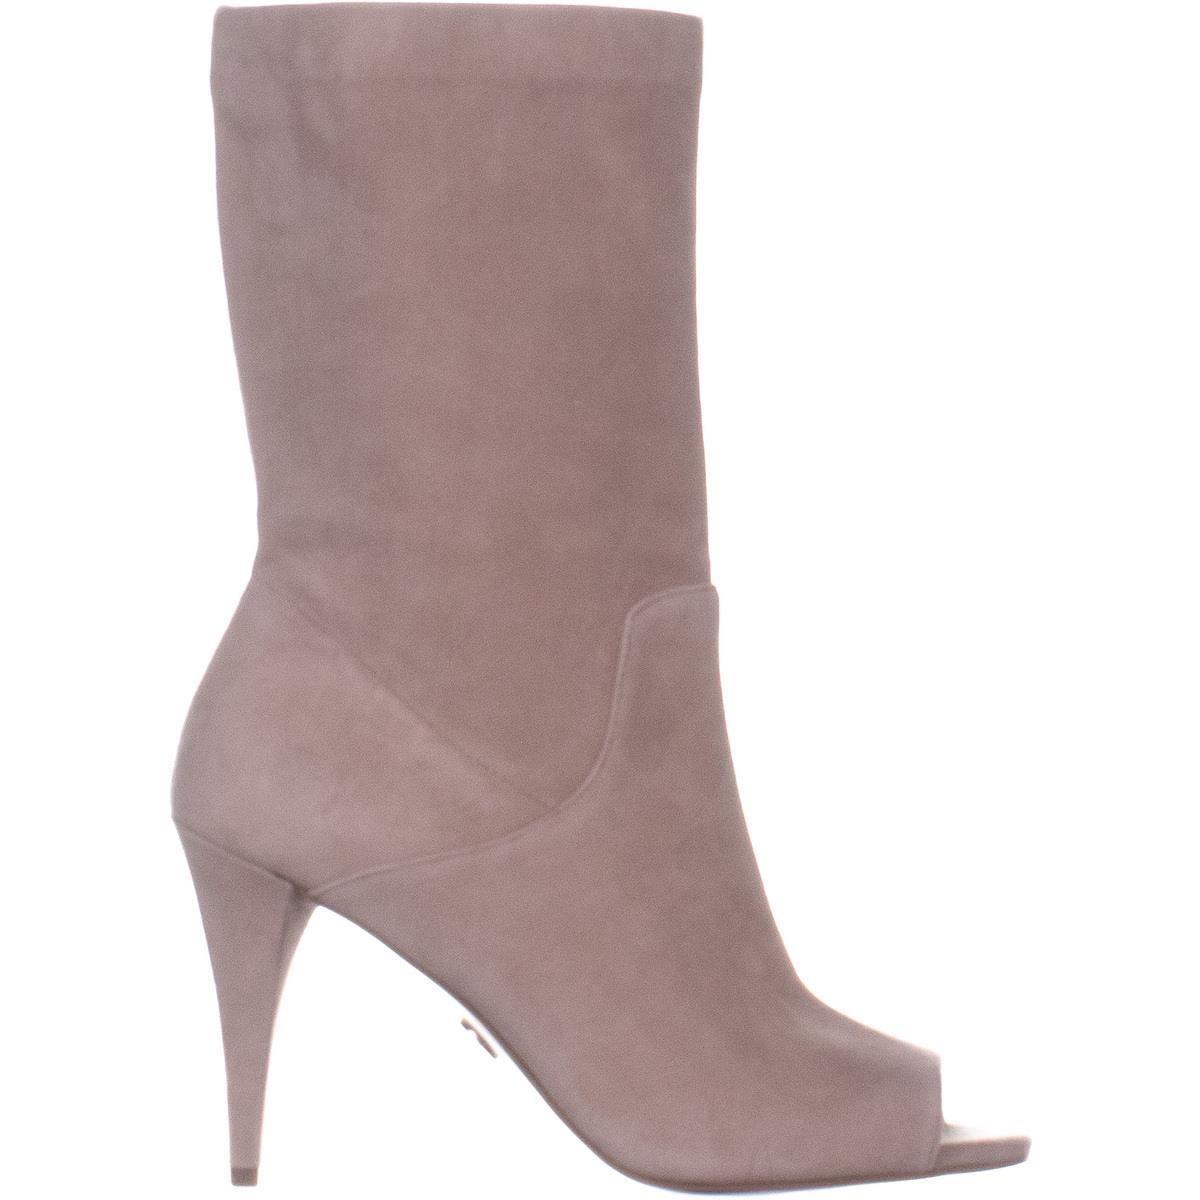 7c055e169 Shop MICHAEL Michael Kors Elaine Open Toe Boots, Truffle - 6.5 us / 36.5 eu  - Free Shipping Today - Overstock - 26059023